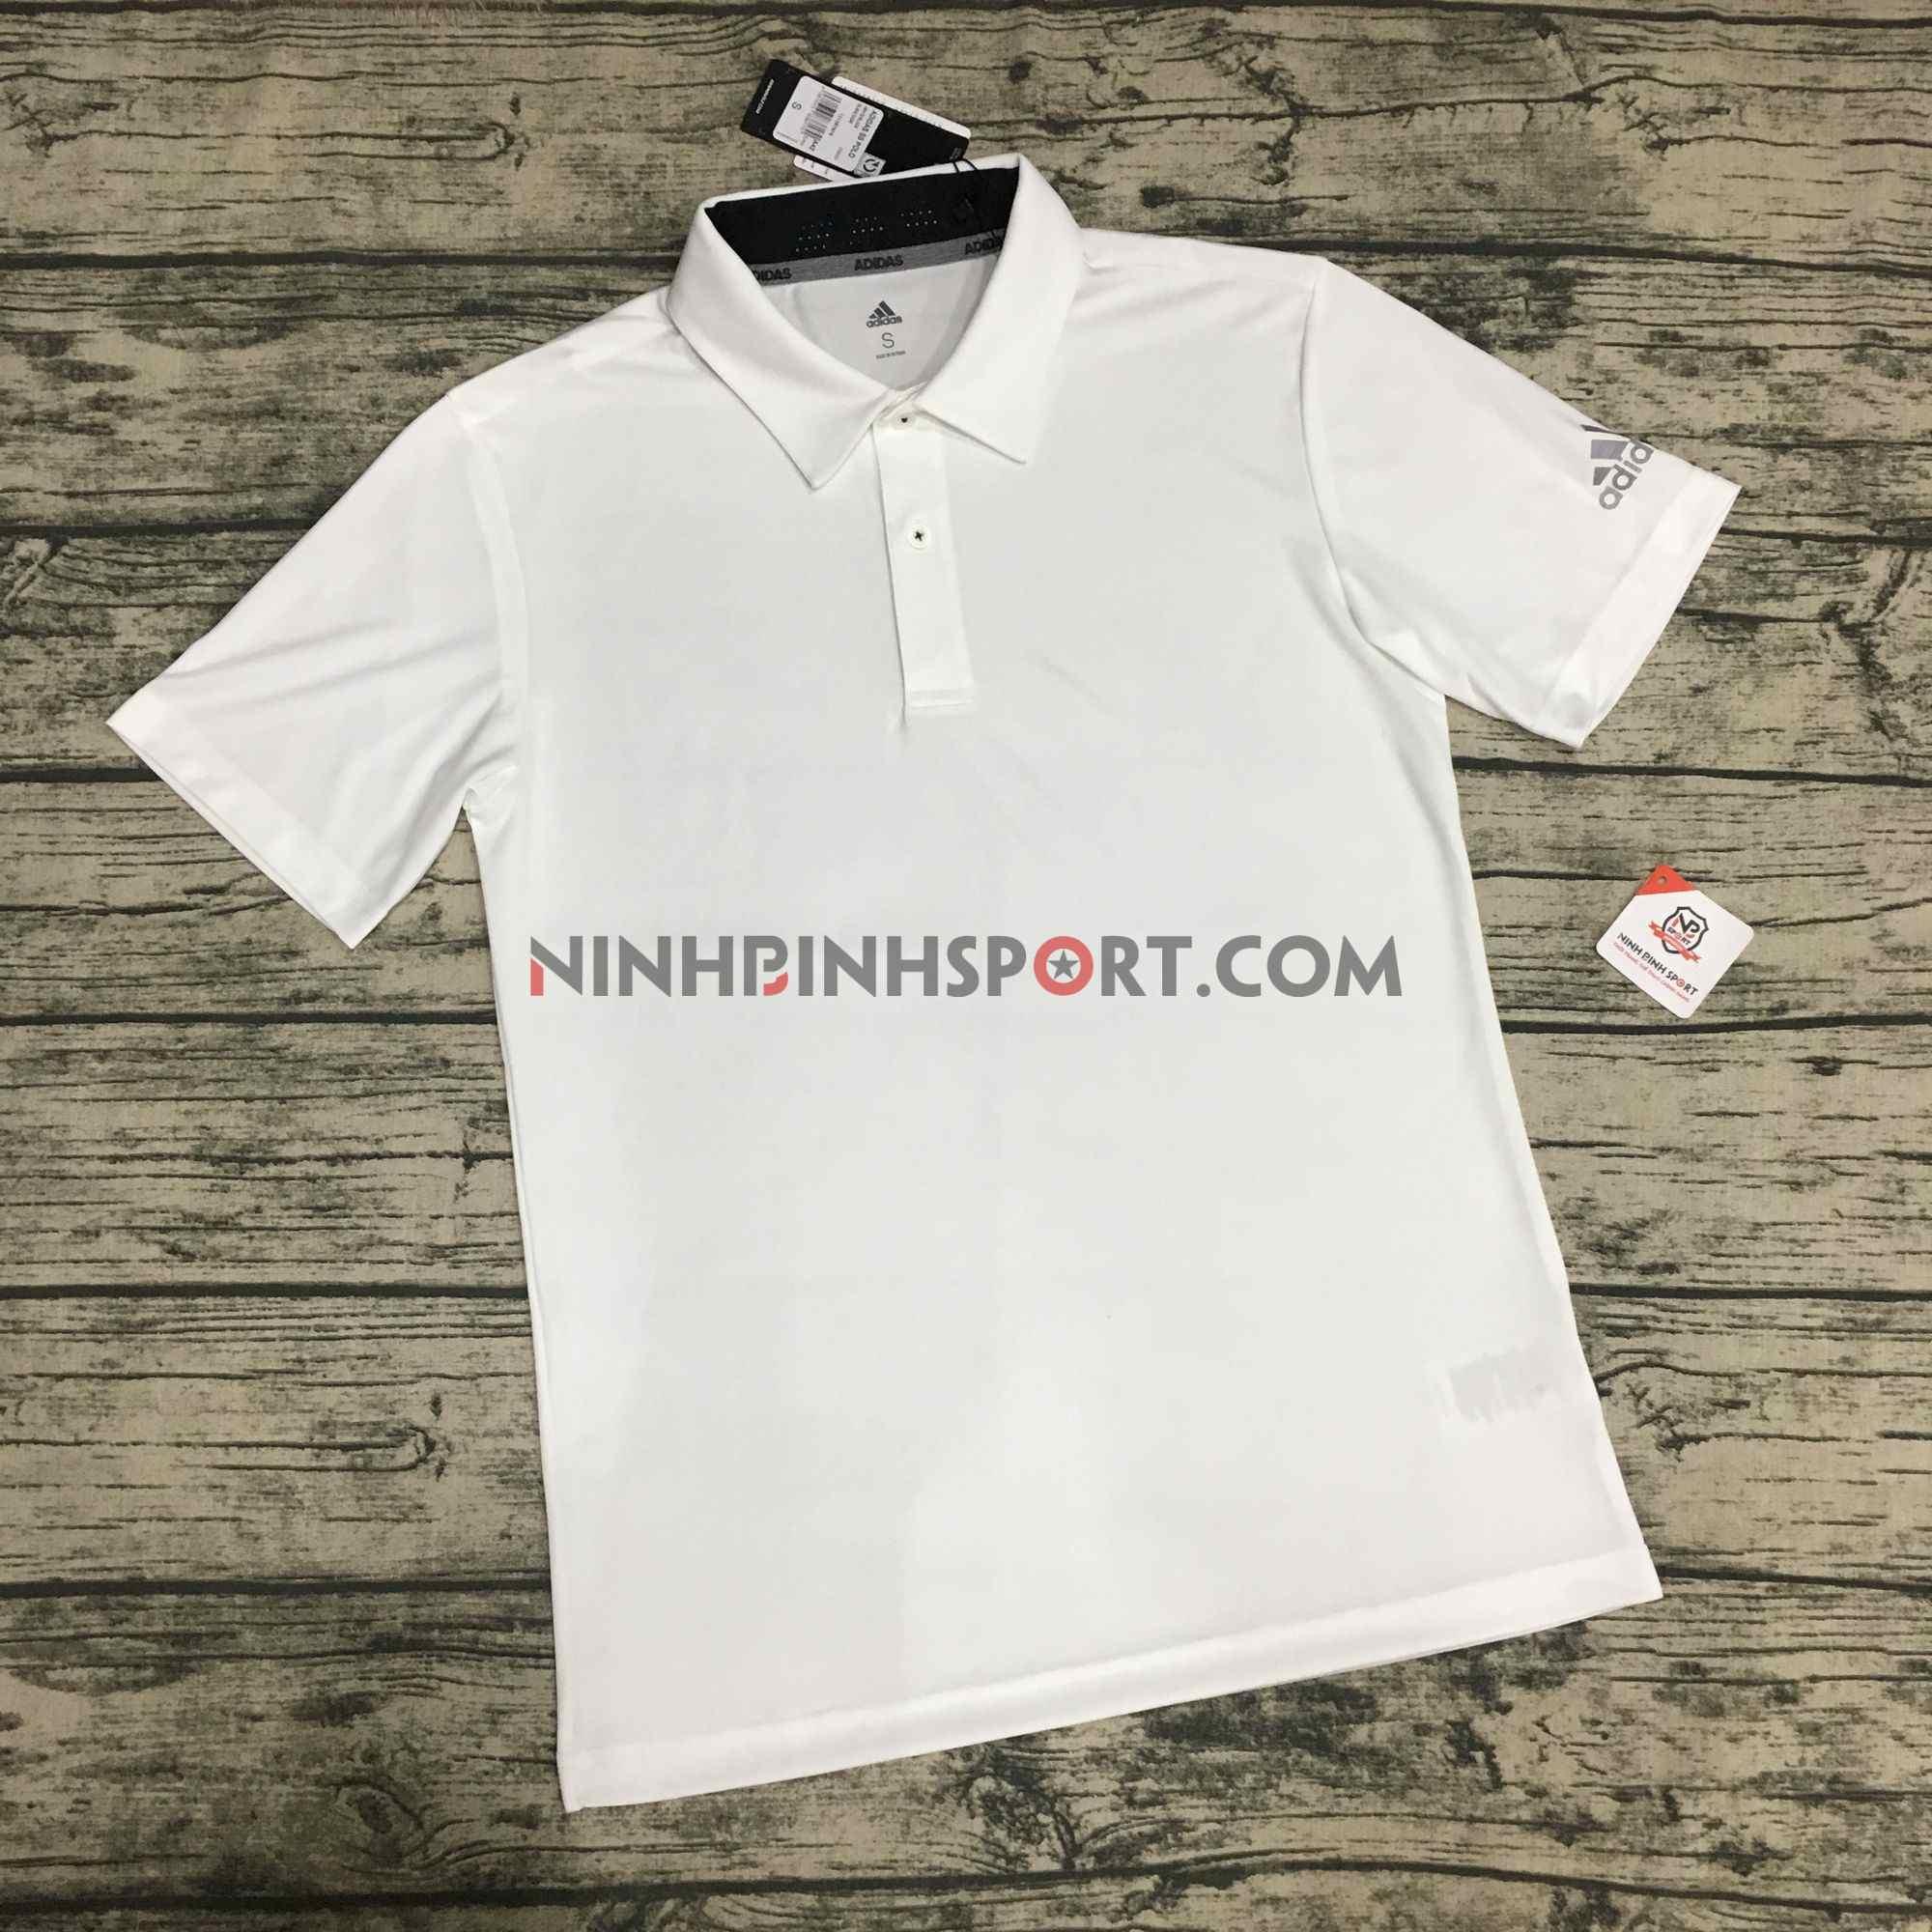 Áo thể thao nam Adidas Golf Polo Shirt DW5597